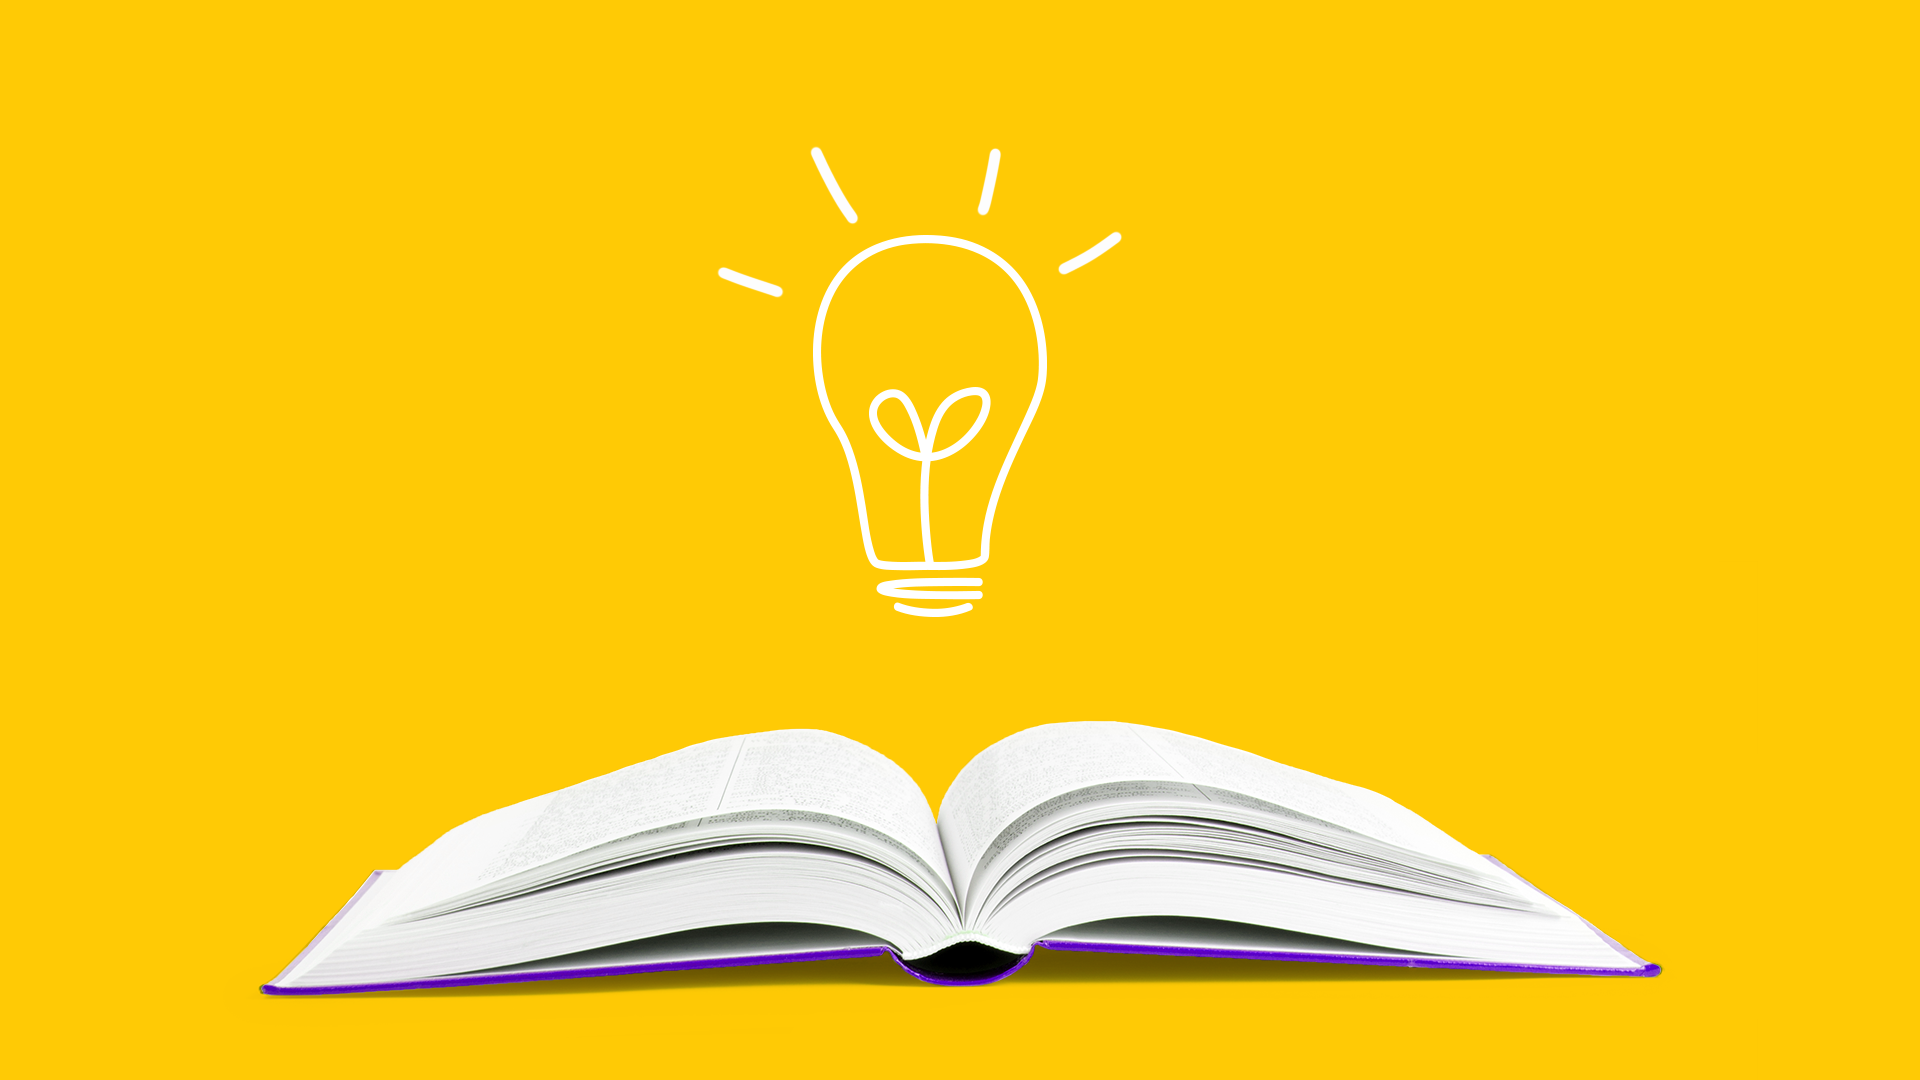 4 ways pharmacists can improve health literacy